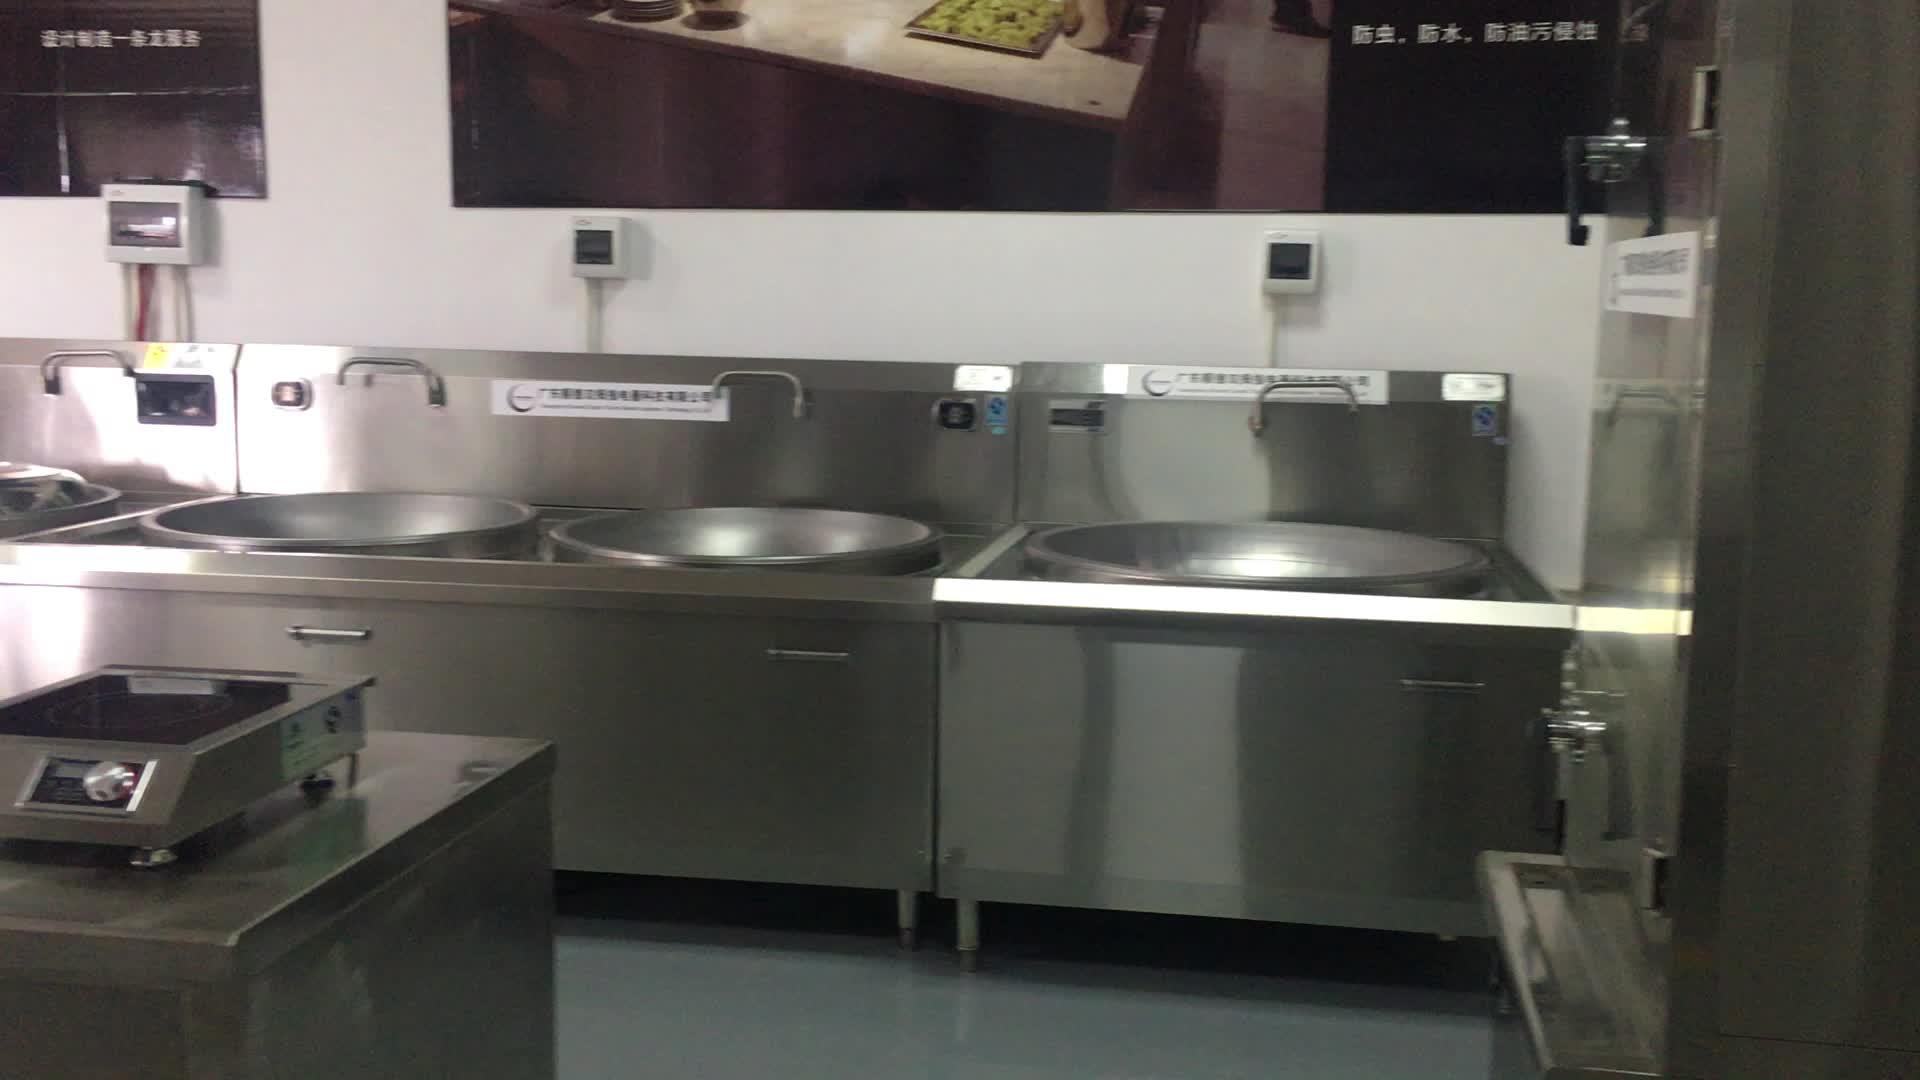 Single Kepala Restoran Hotel Dapur Stainless Steel Komersial Wok 3.5KW 5KW Kompor Induksi